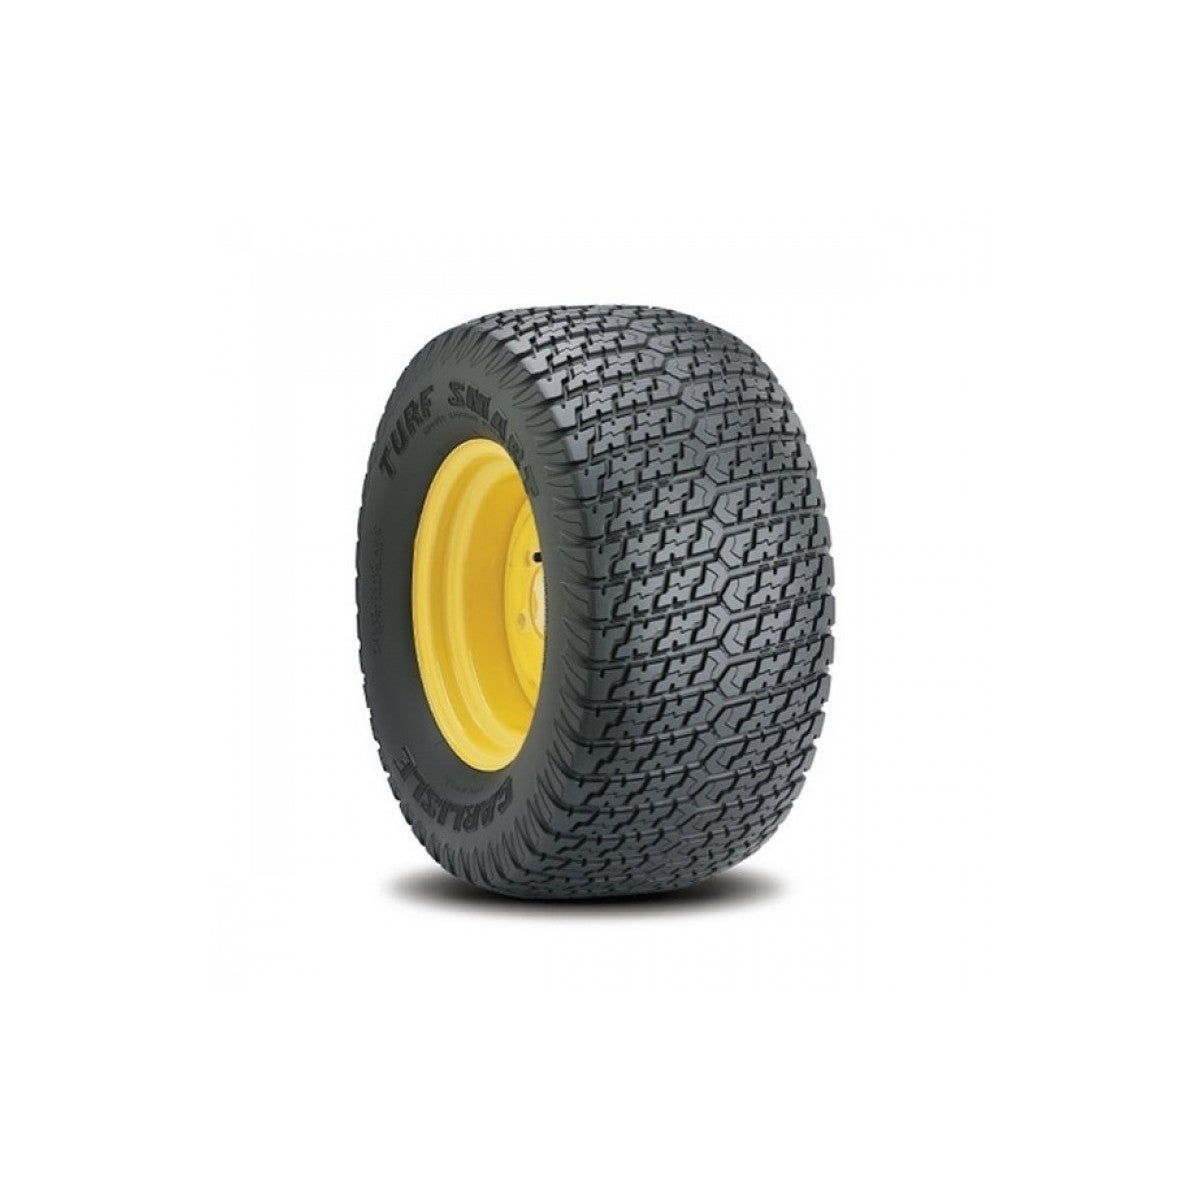 Carlisle Turf Smart Lawn & Garden Tire - 23X1050-12 LRB/4...